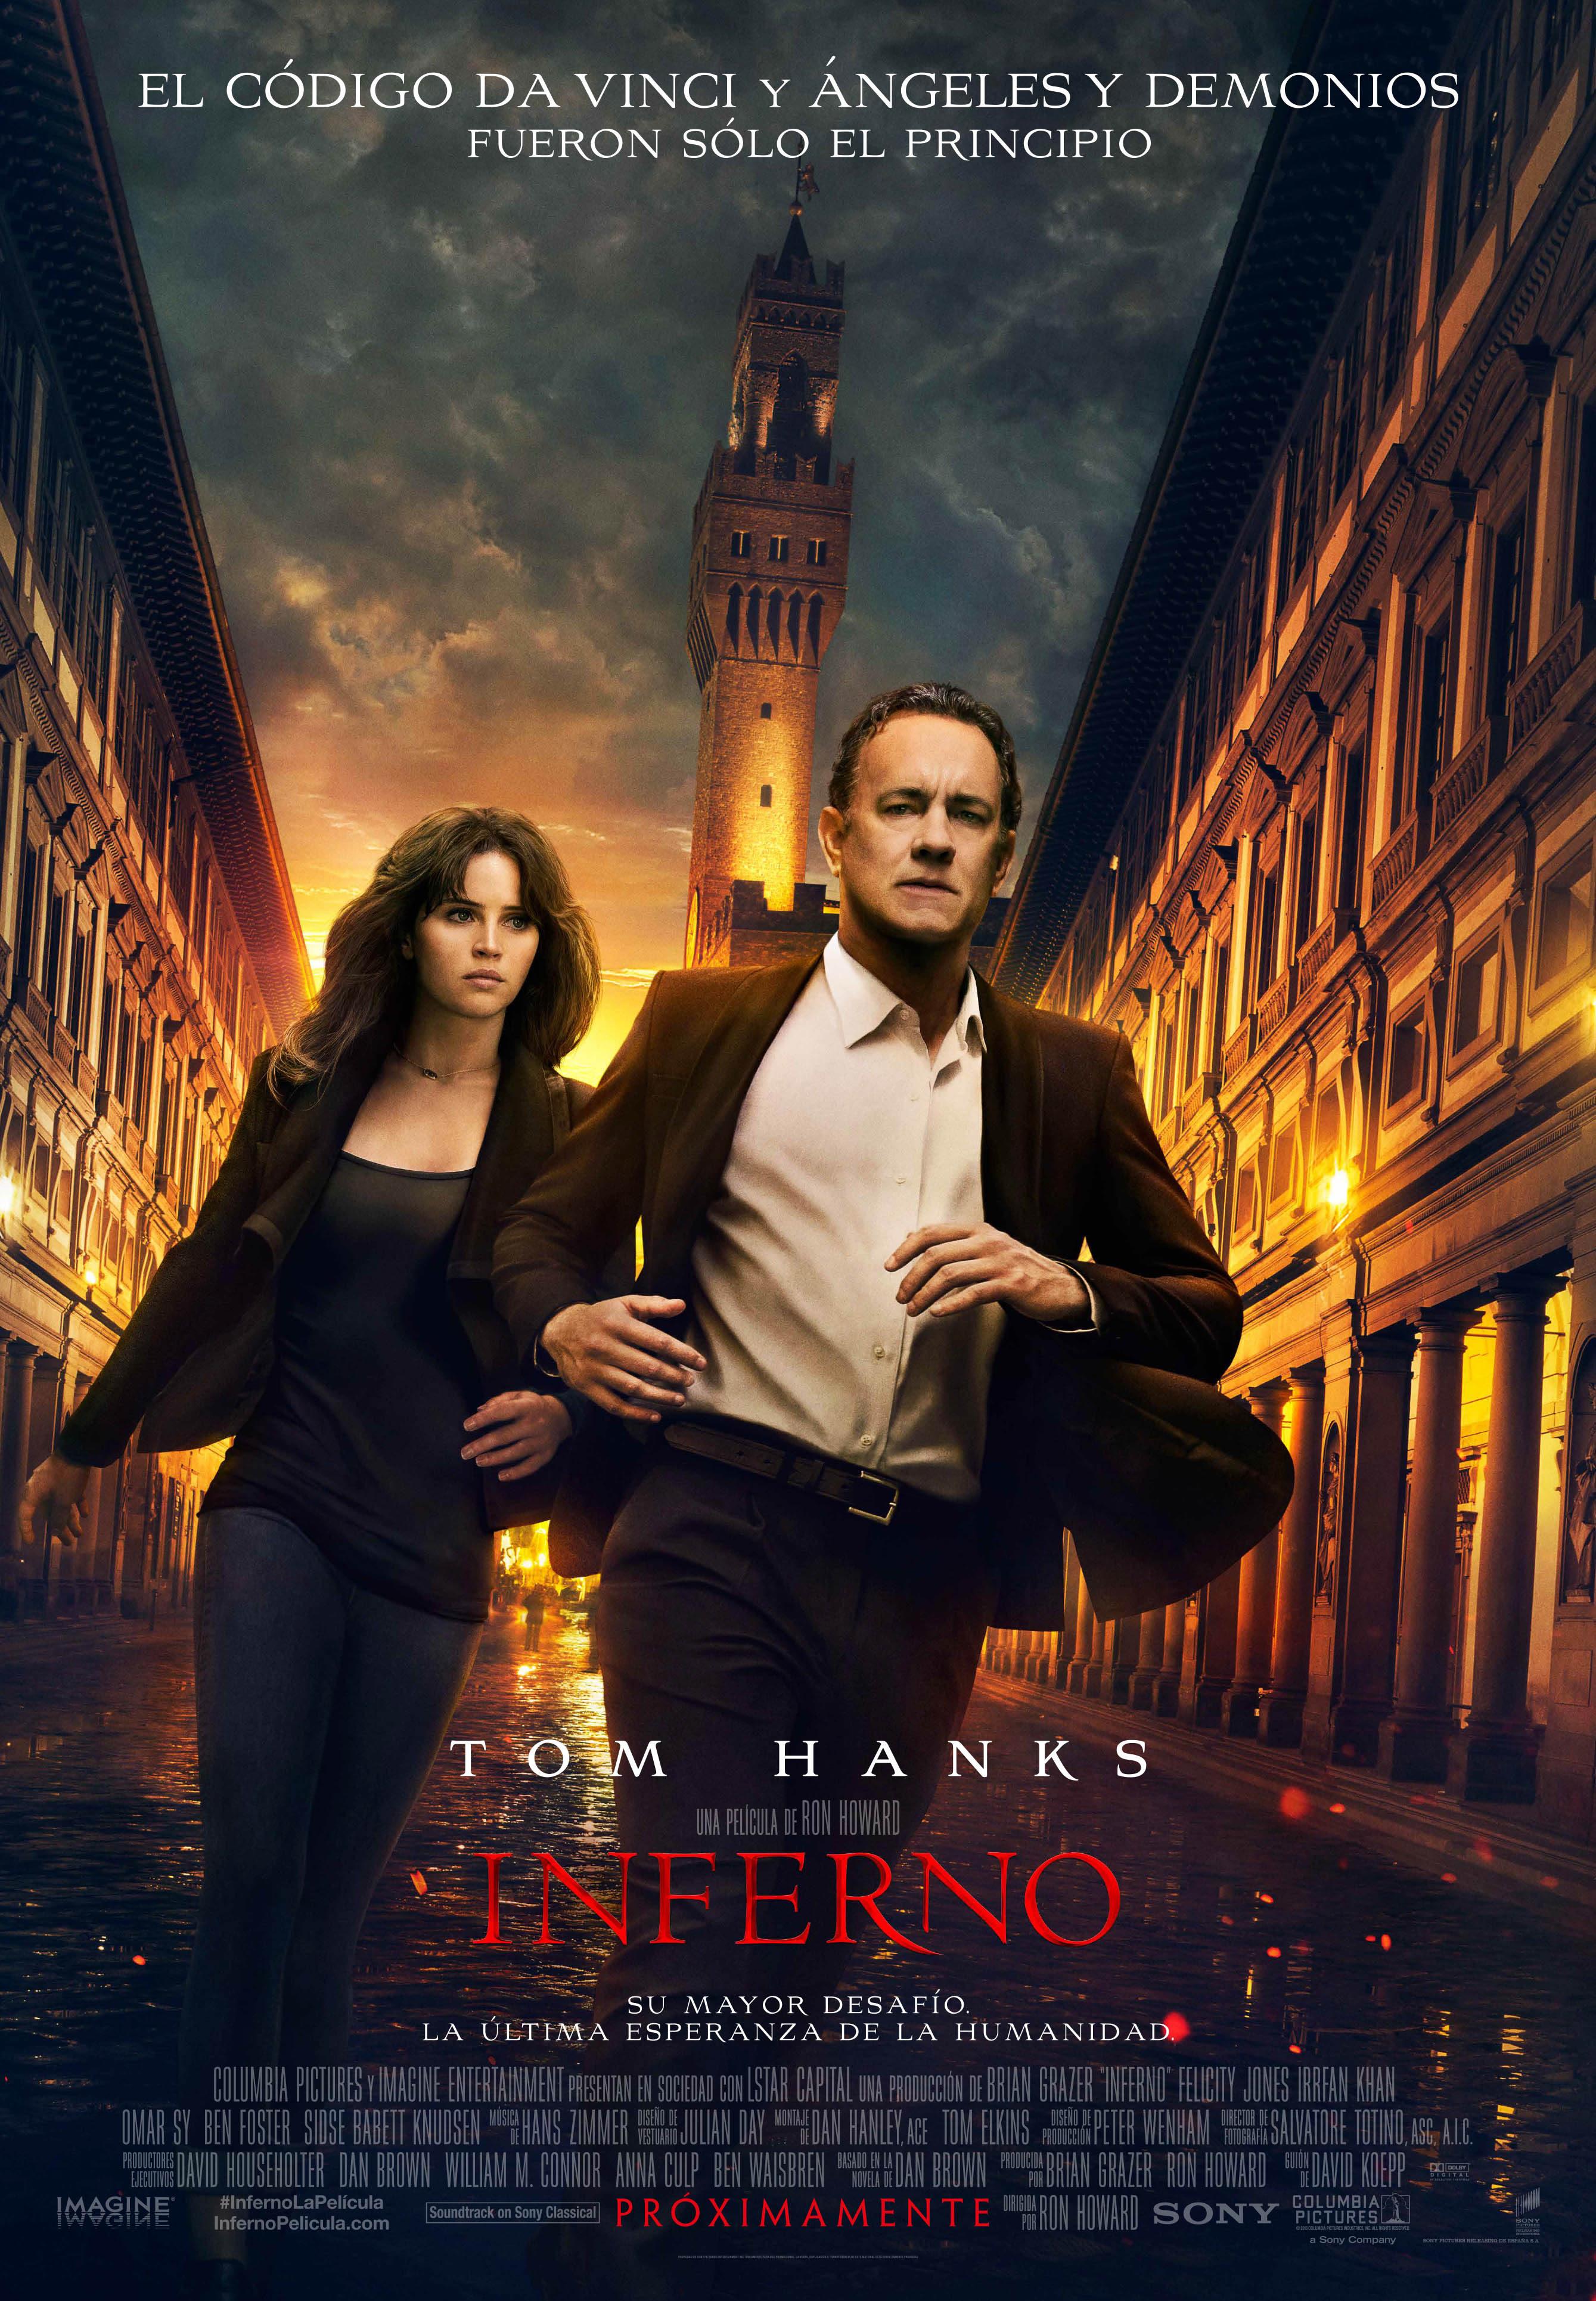 http://www.movienco.co.uk/carteles/6700/6759/005_dx27mu.jpg